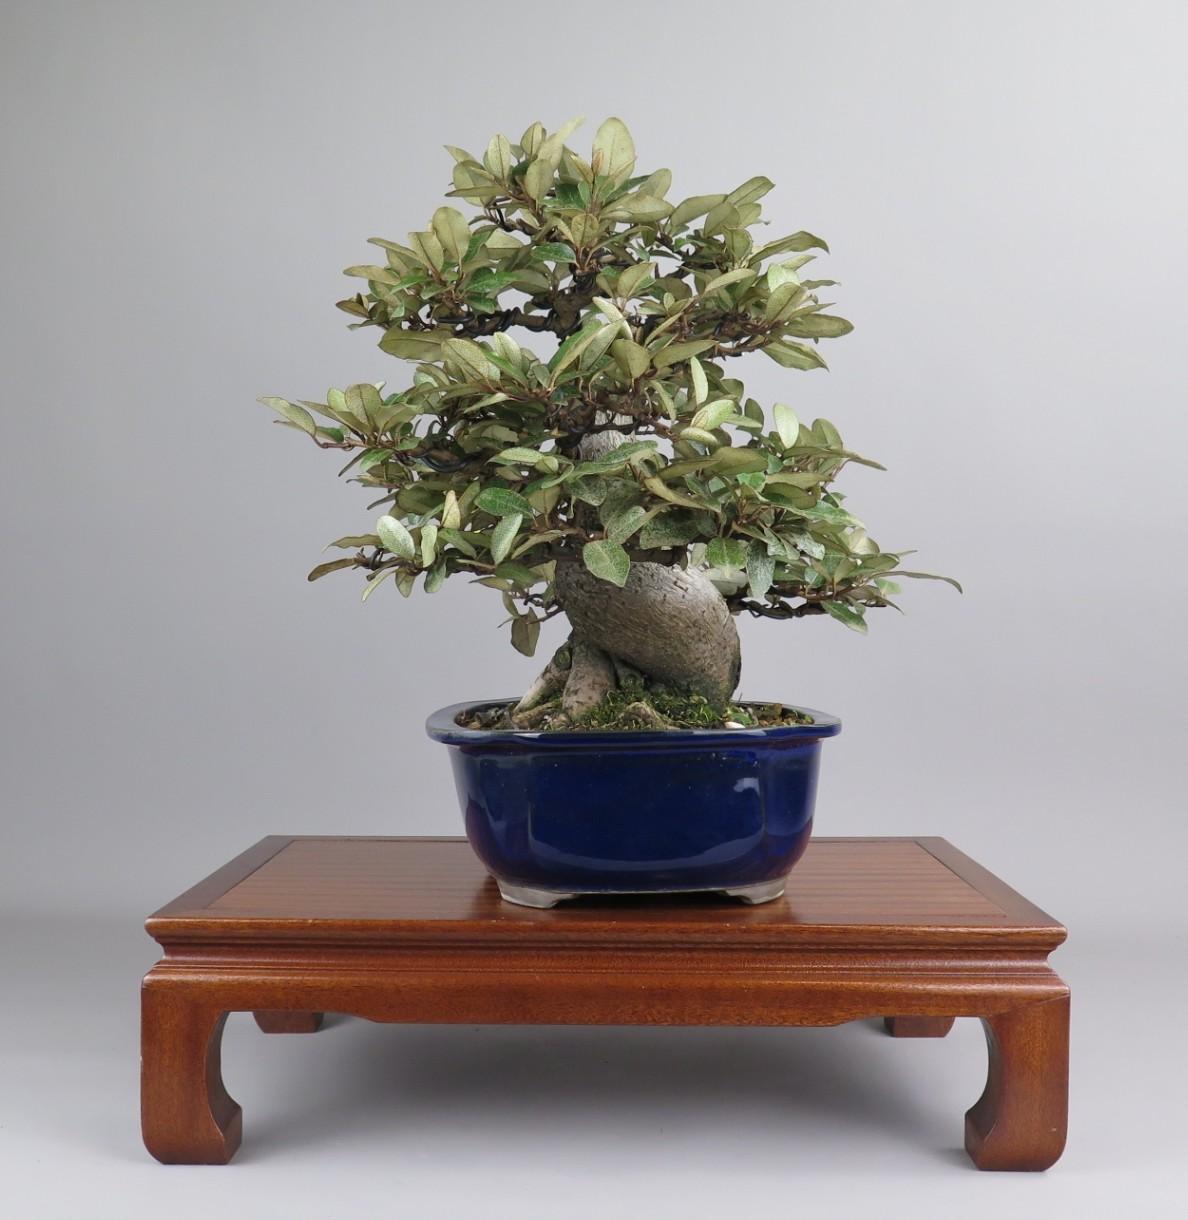 Bonsai de Eleagnus lateral izquierdo